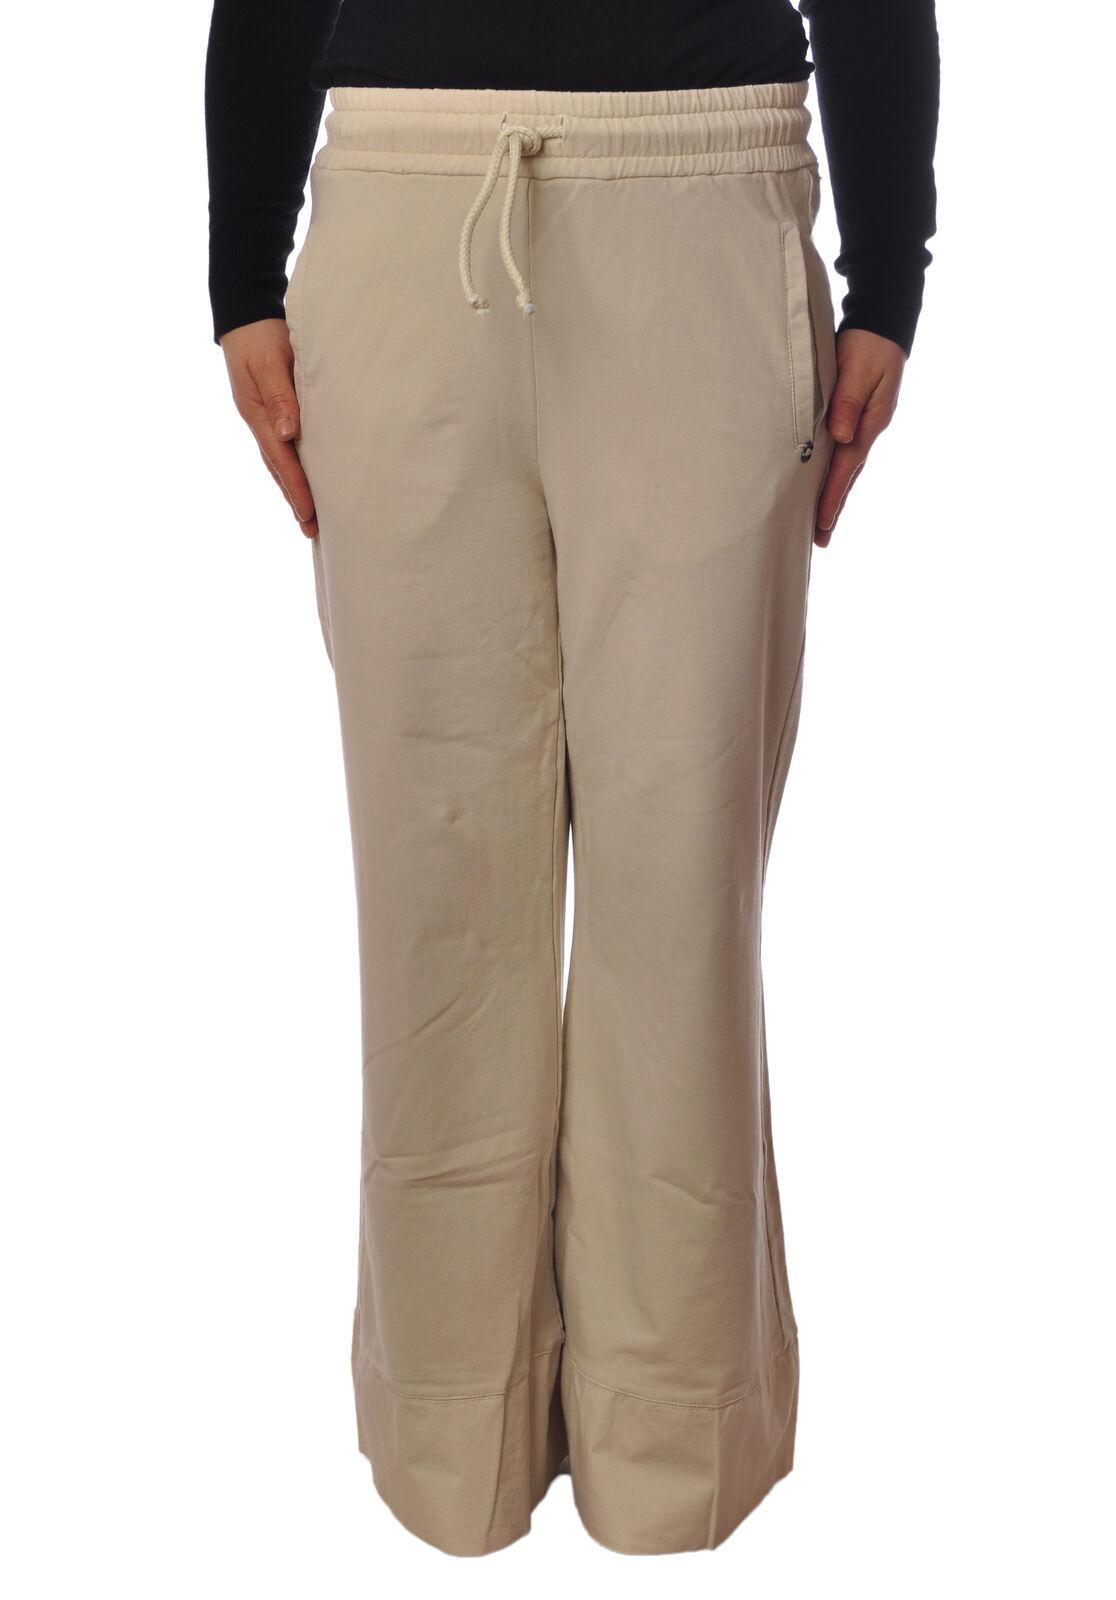 Ottod  & 039;ame-Pantalones-Pantalones-Mujer - Beige - 4971026E184510  venta